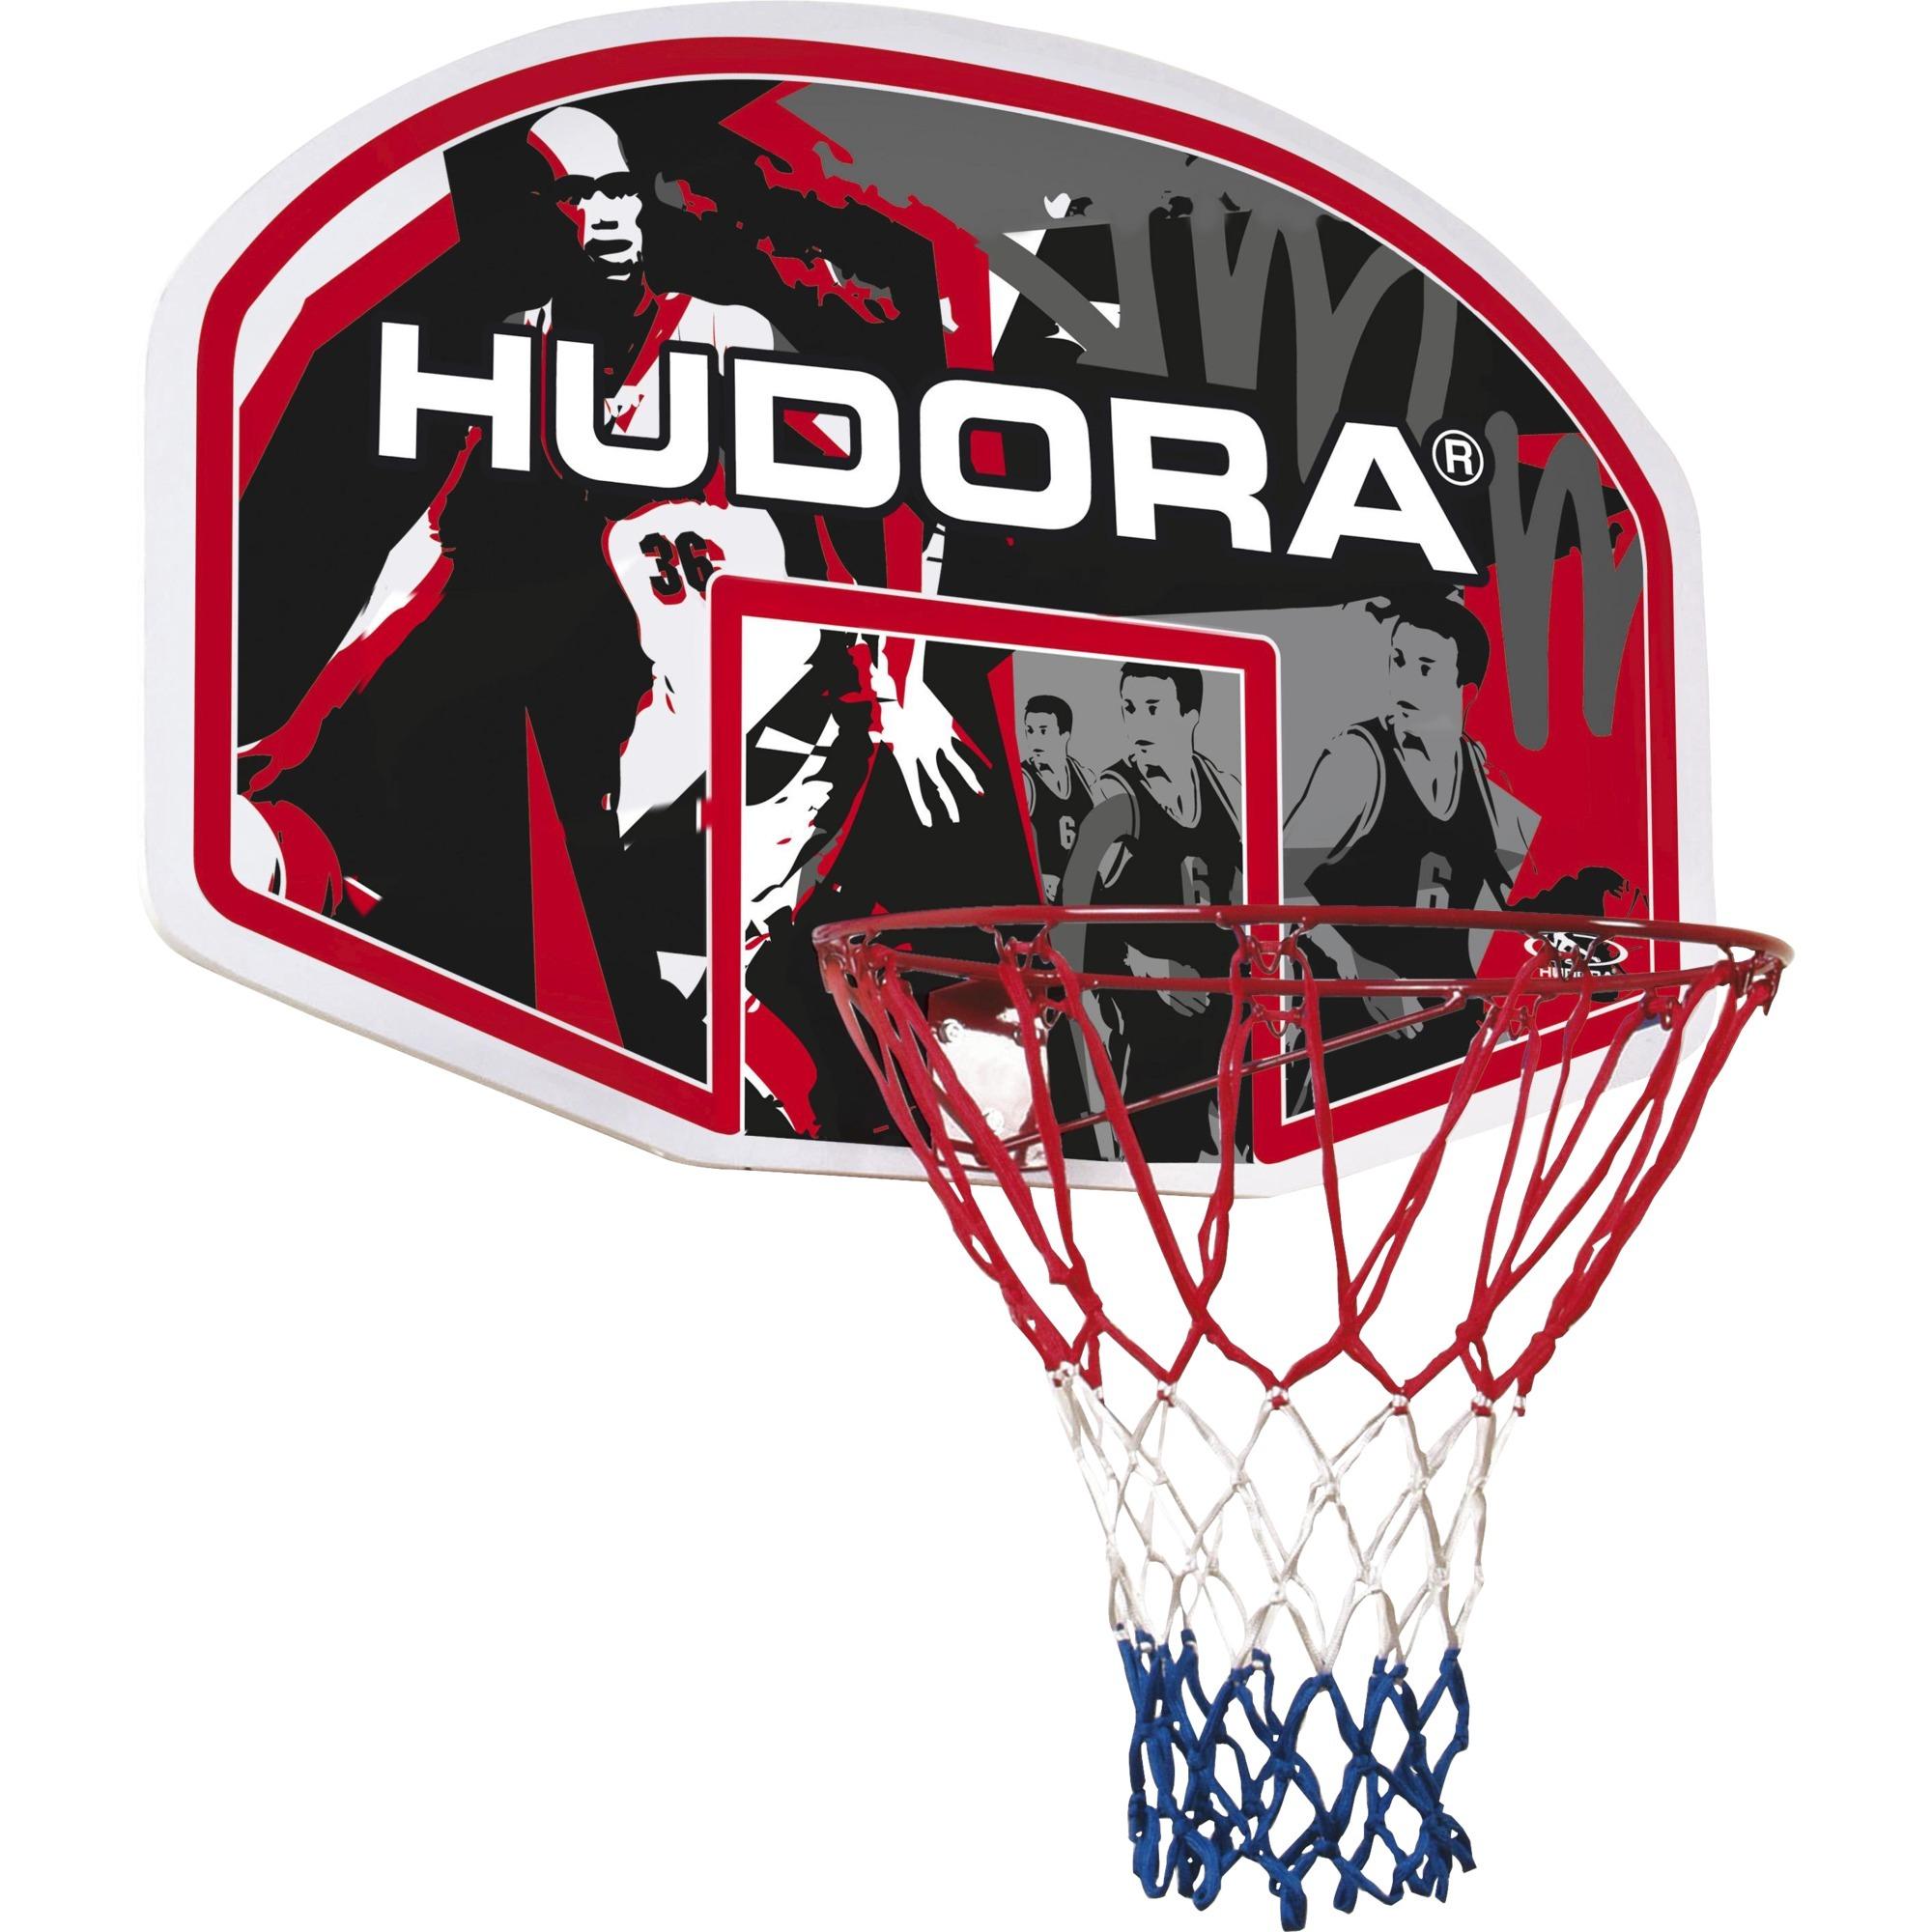 basketballkorbset-in-outdoor-basketballkurv